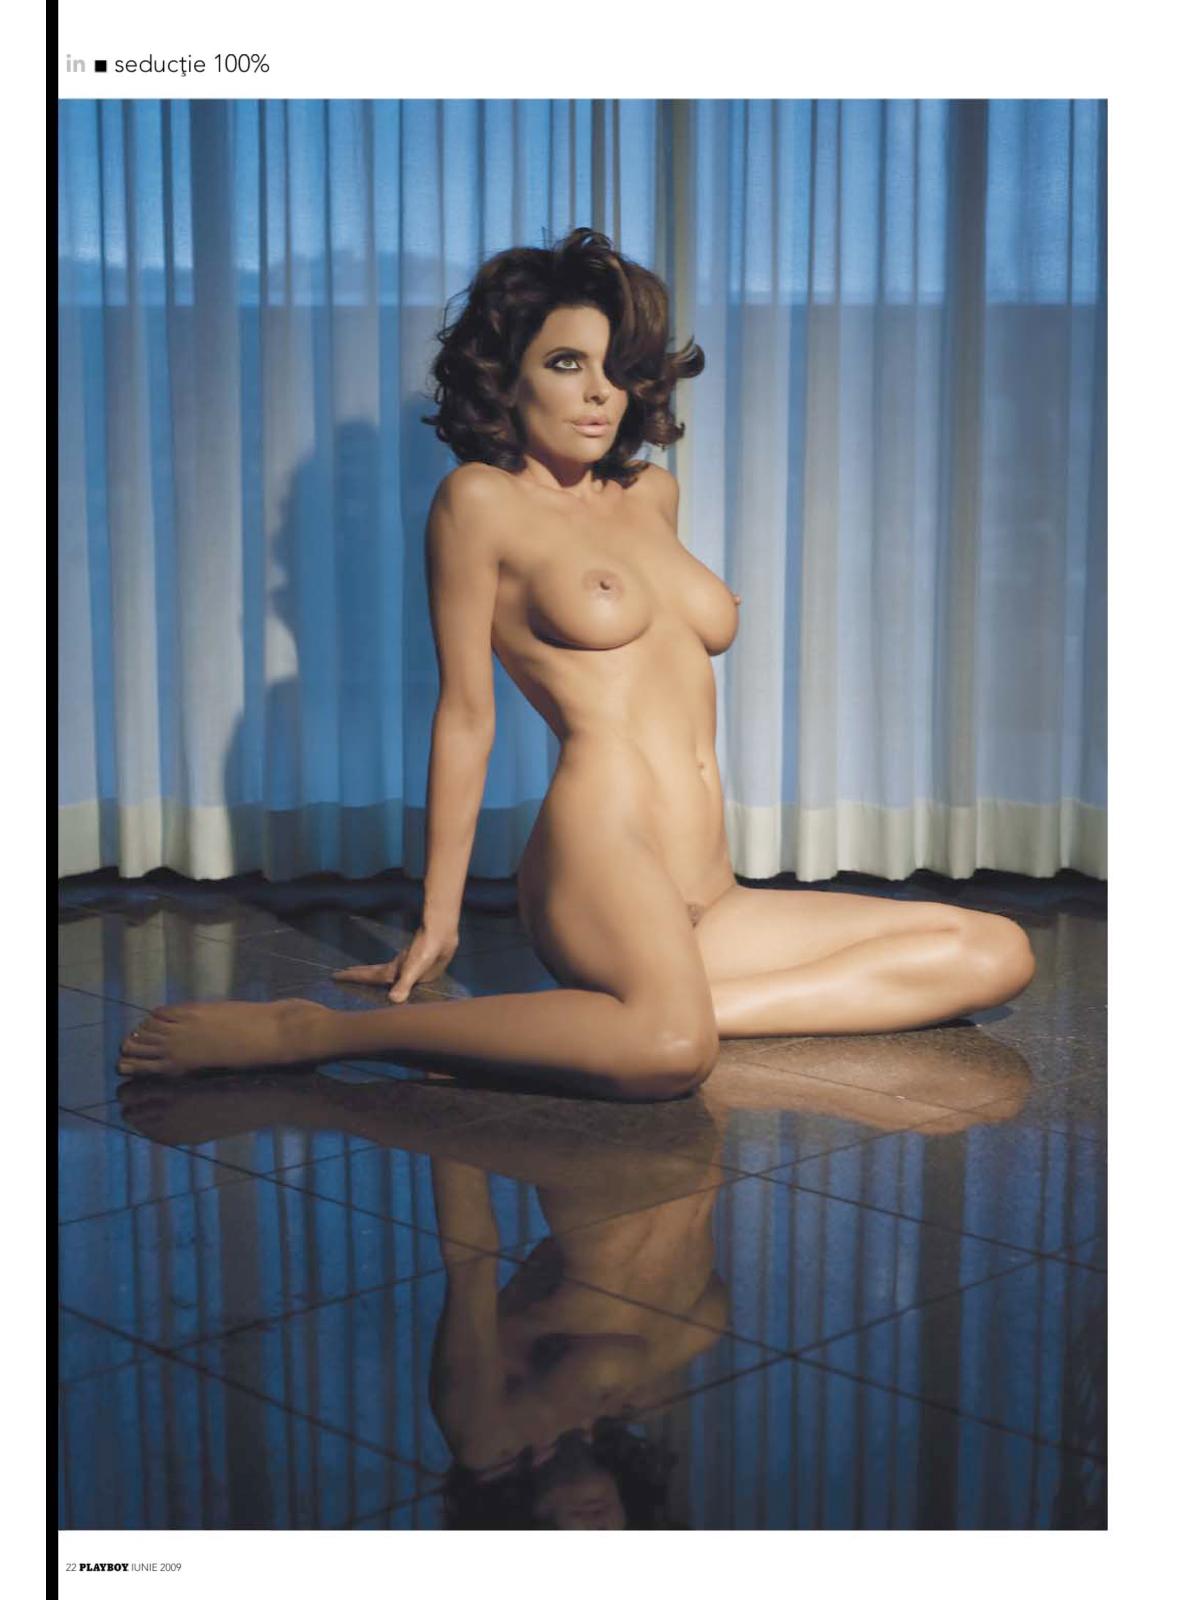 00360_Lisa_Rinna_Playboy_2009-06_Romania_06_123_588lo.jpg